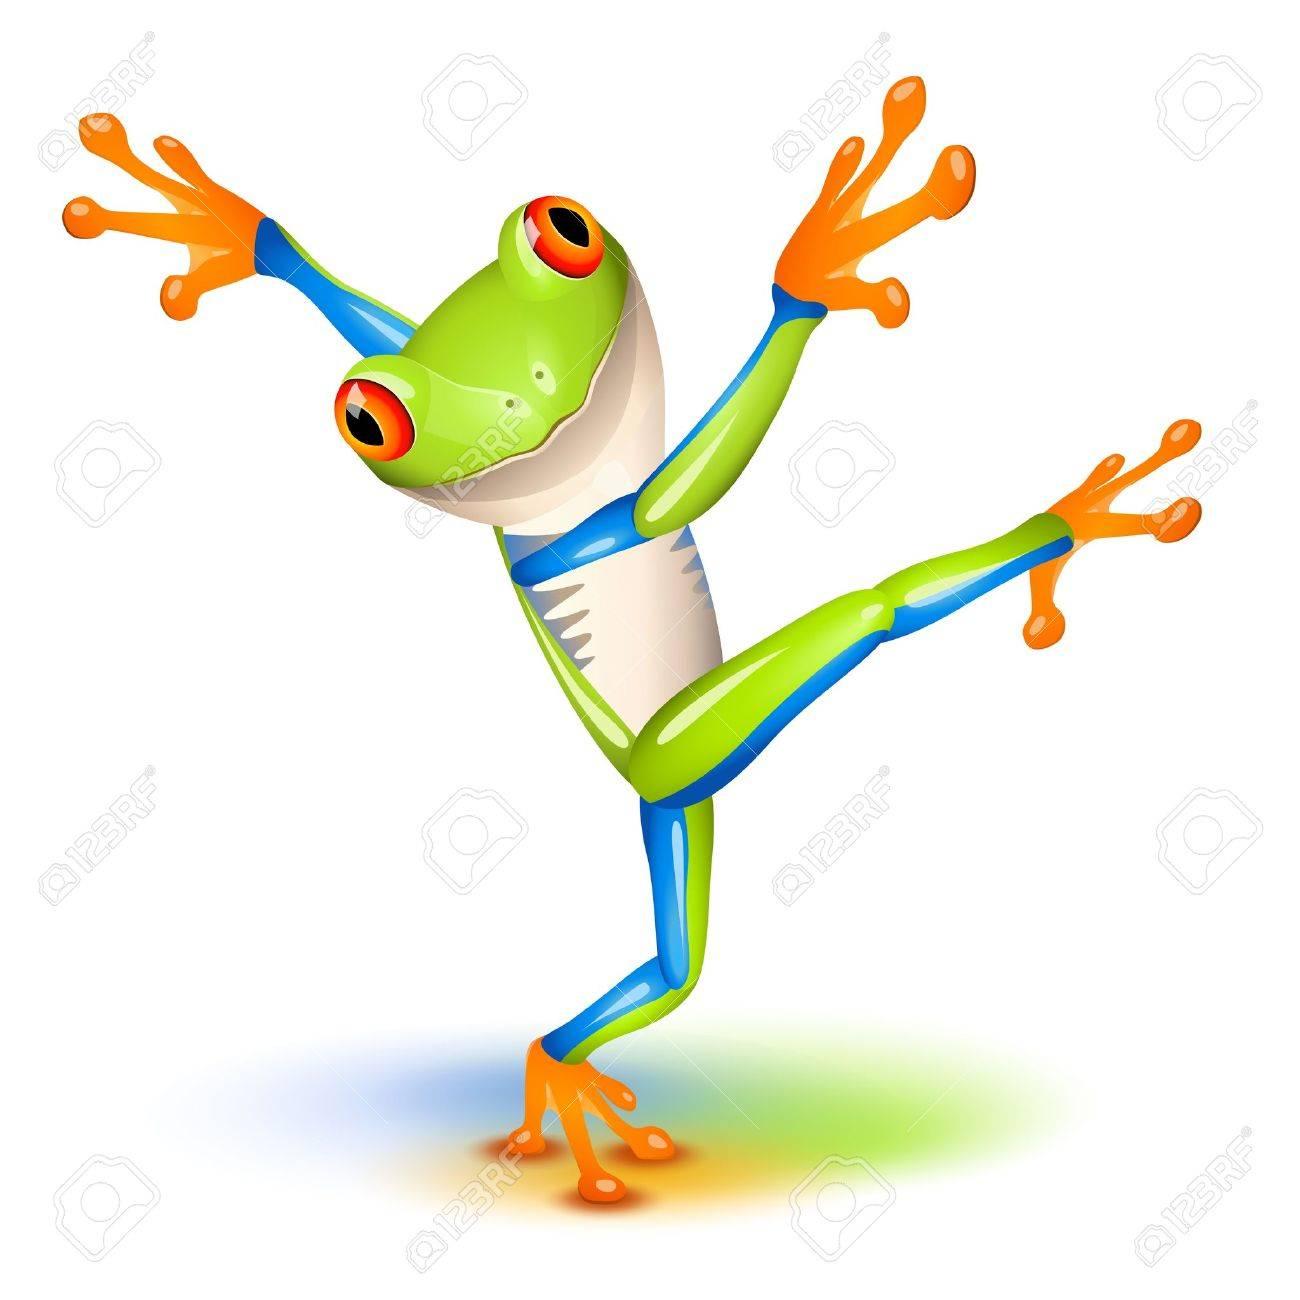 Dancing Tree Frog in equilibrium - 13283267